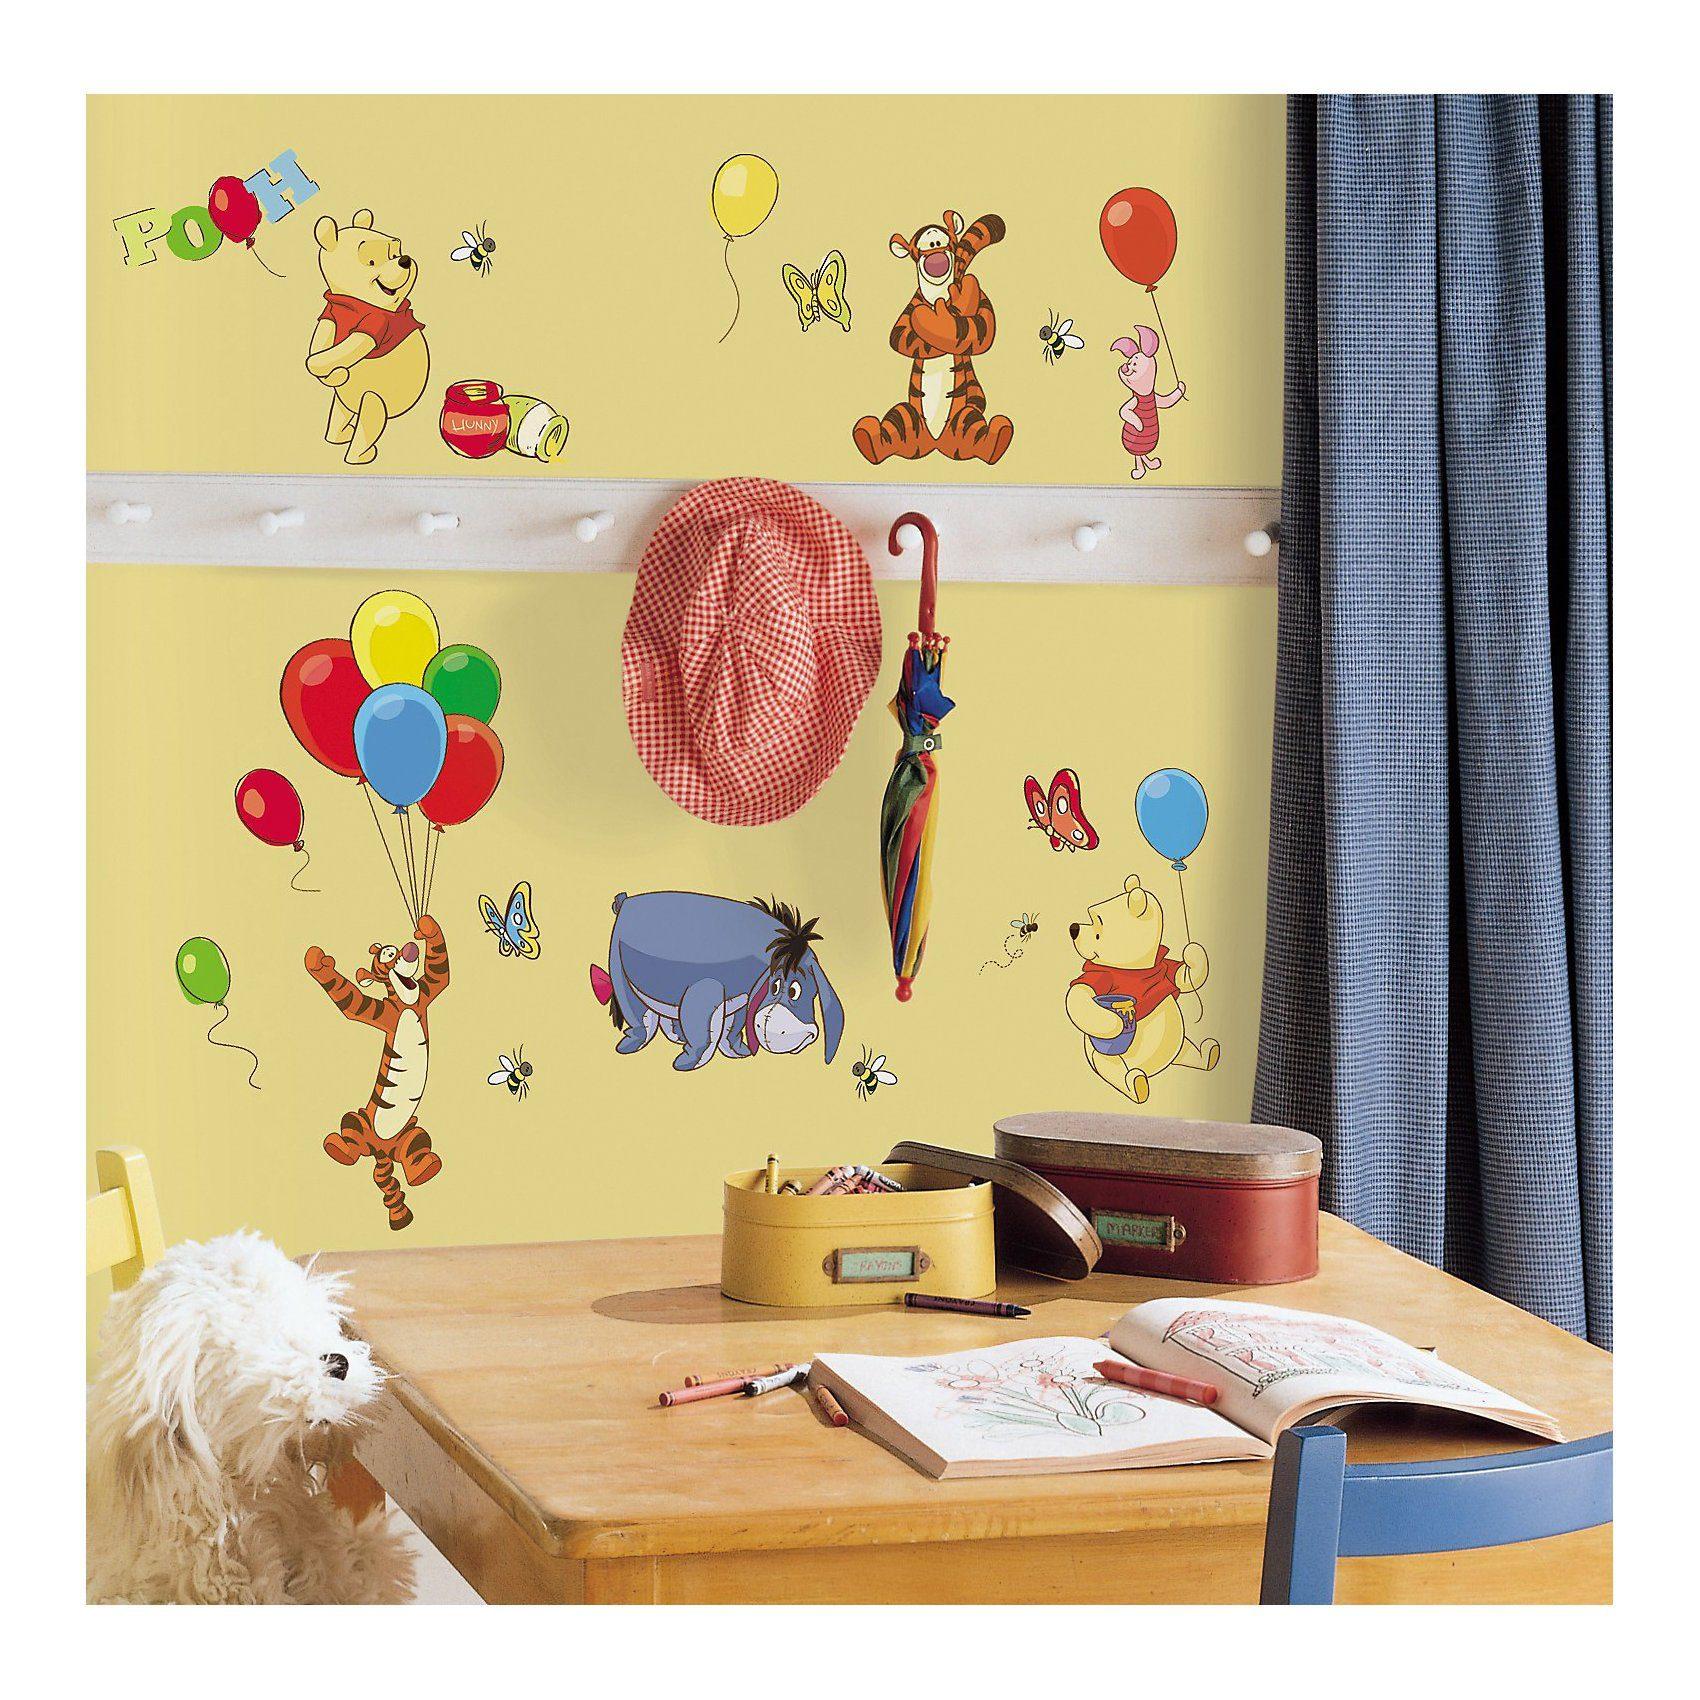 RoomMates Wandsticker Winnie the Pooh, 38-tlg.